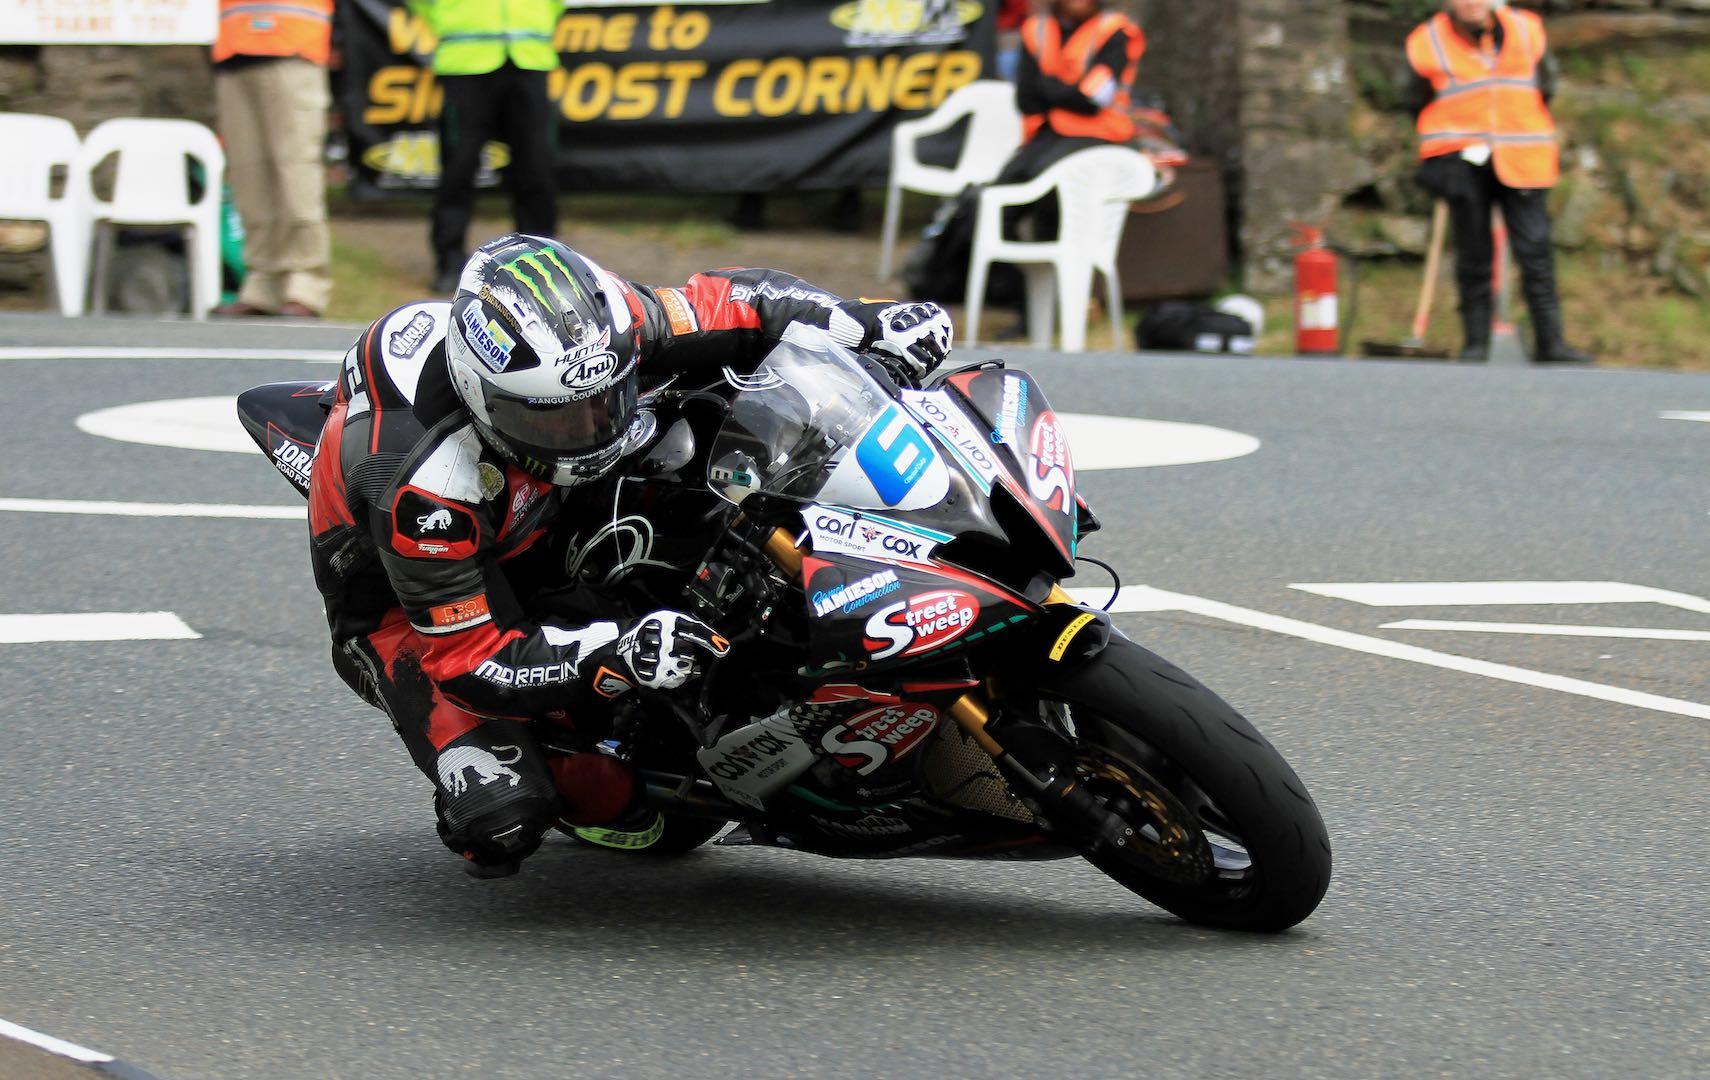 2017 Monster Energy Supersport 1 TT: Yamaha's Michael Dunlop